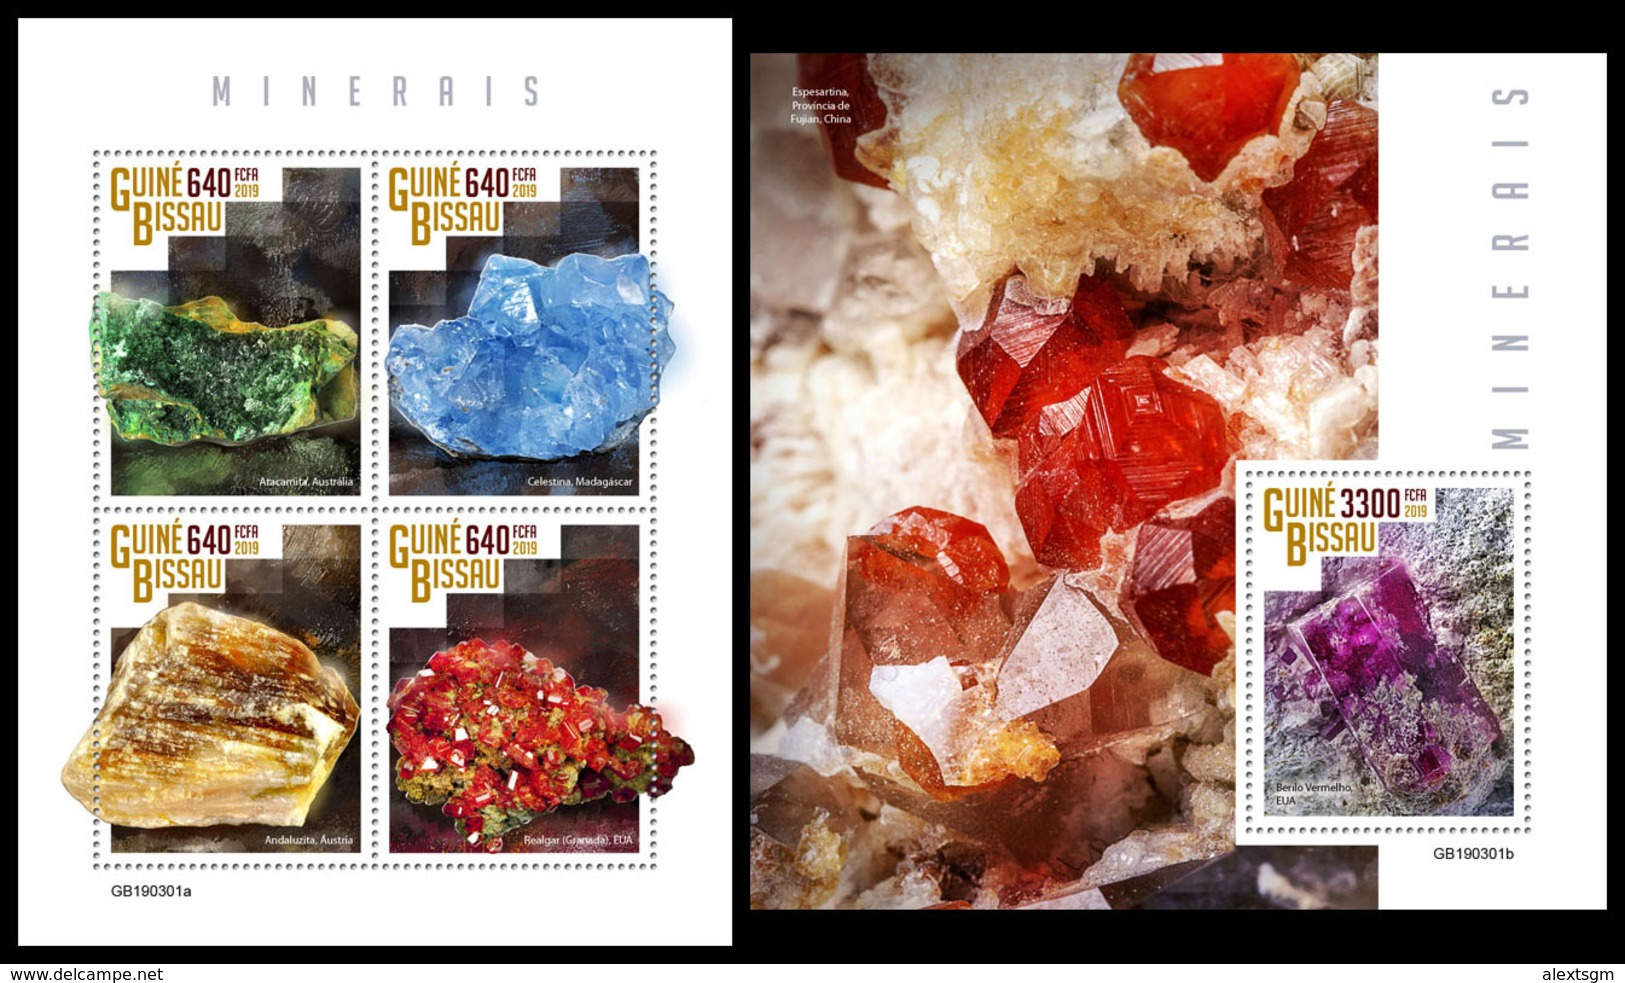 GUINEA BISSAU 2019 - Minerals. M/S + S/S. Official Issue [GB190301] - Mineralen